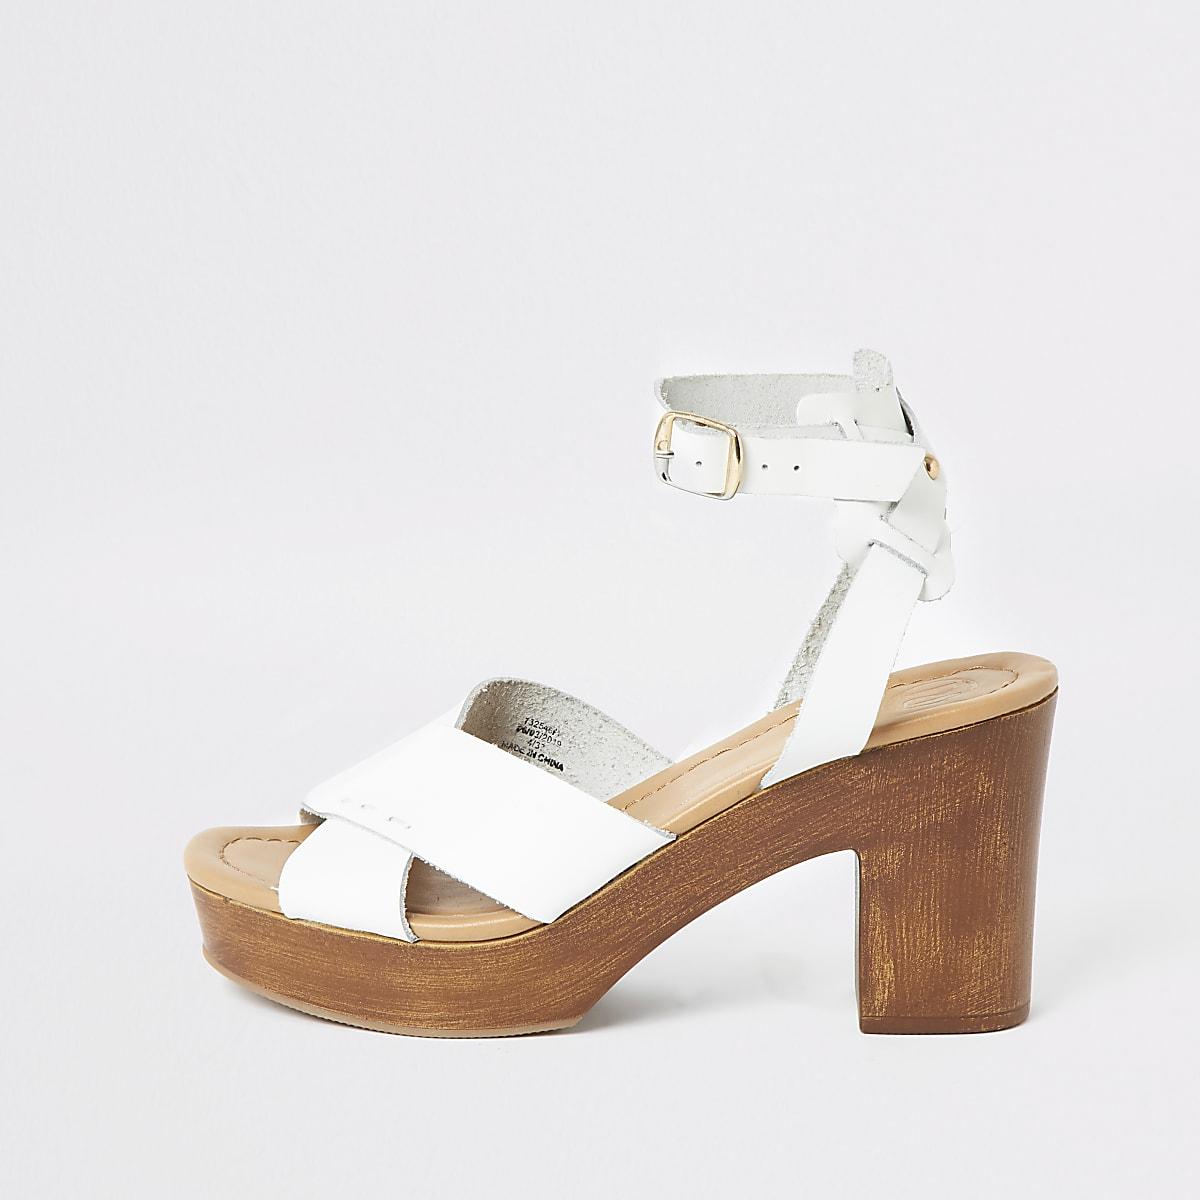 White leather cross platform sandals